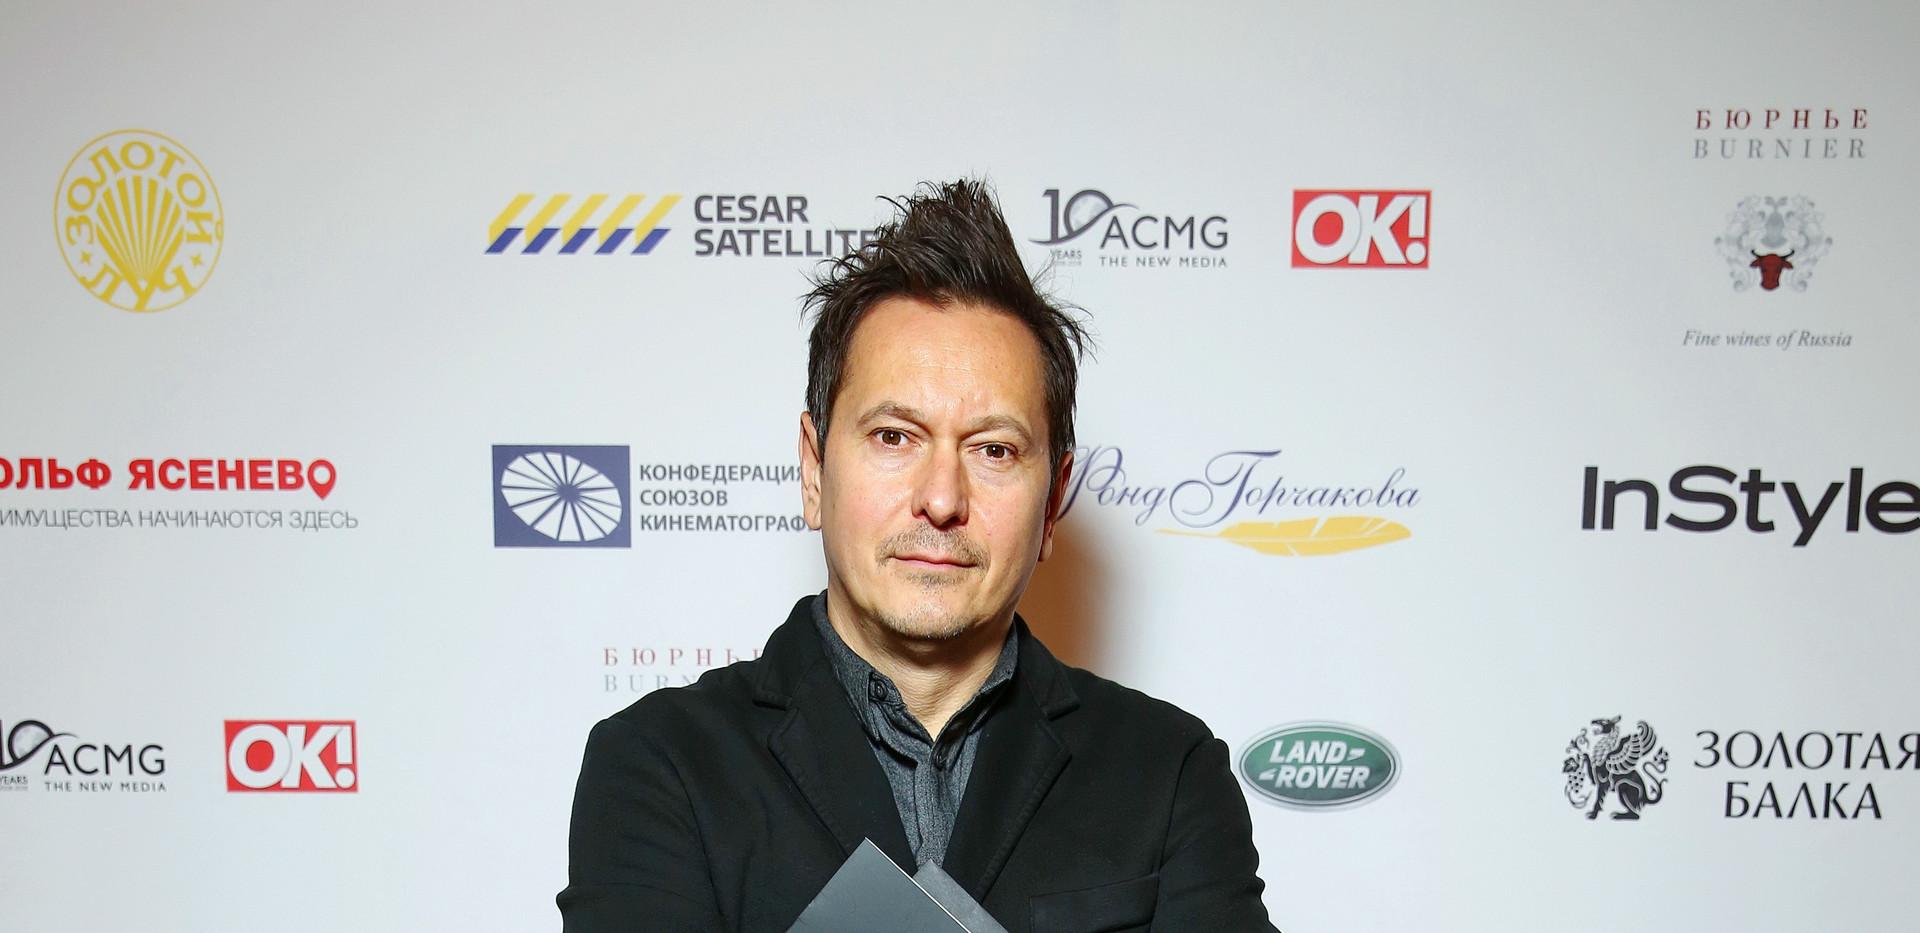 Владислав Опельянц.JPG